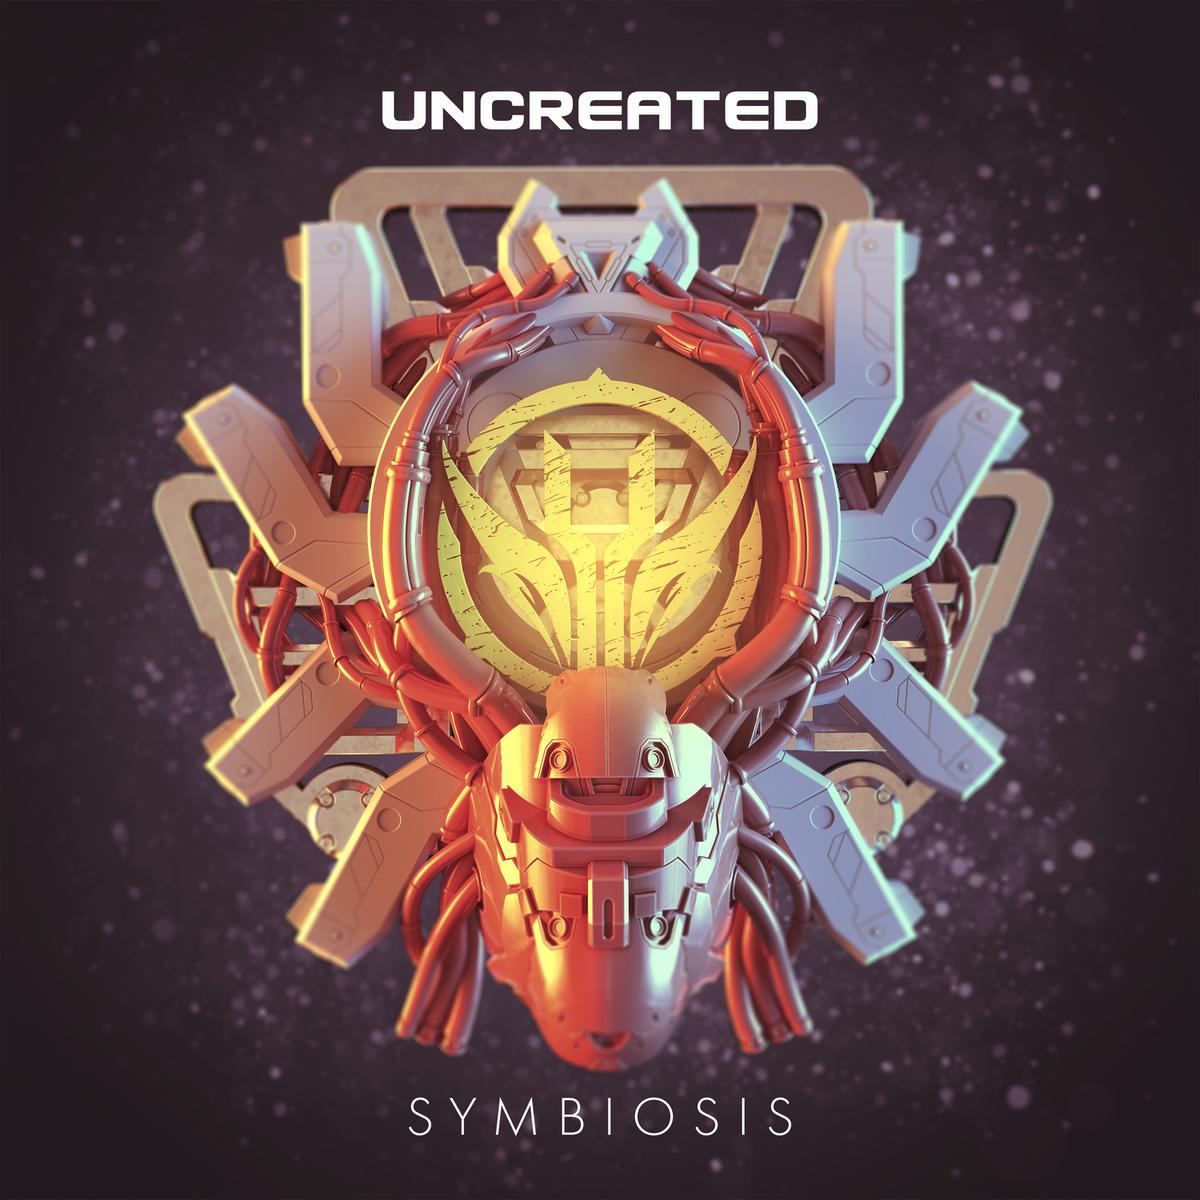 Symbiosis cover artwork